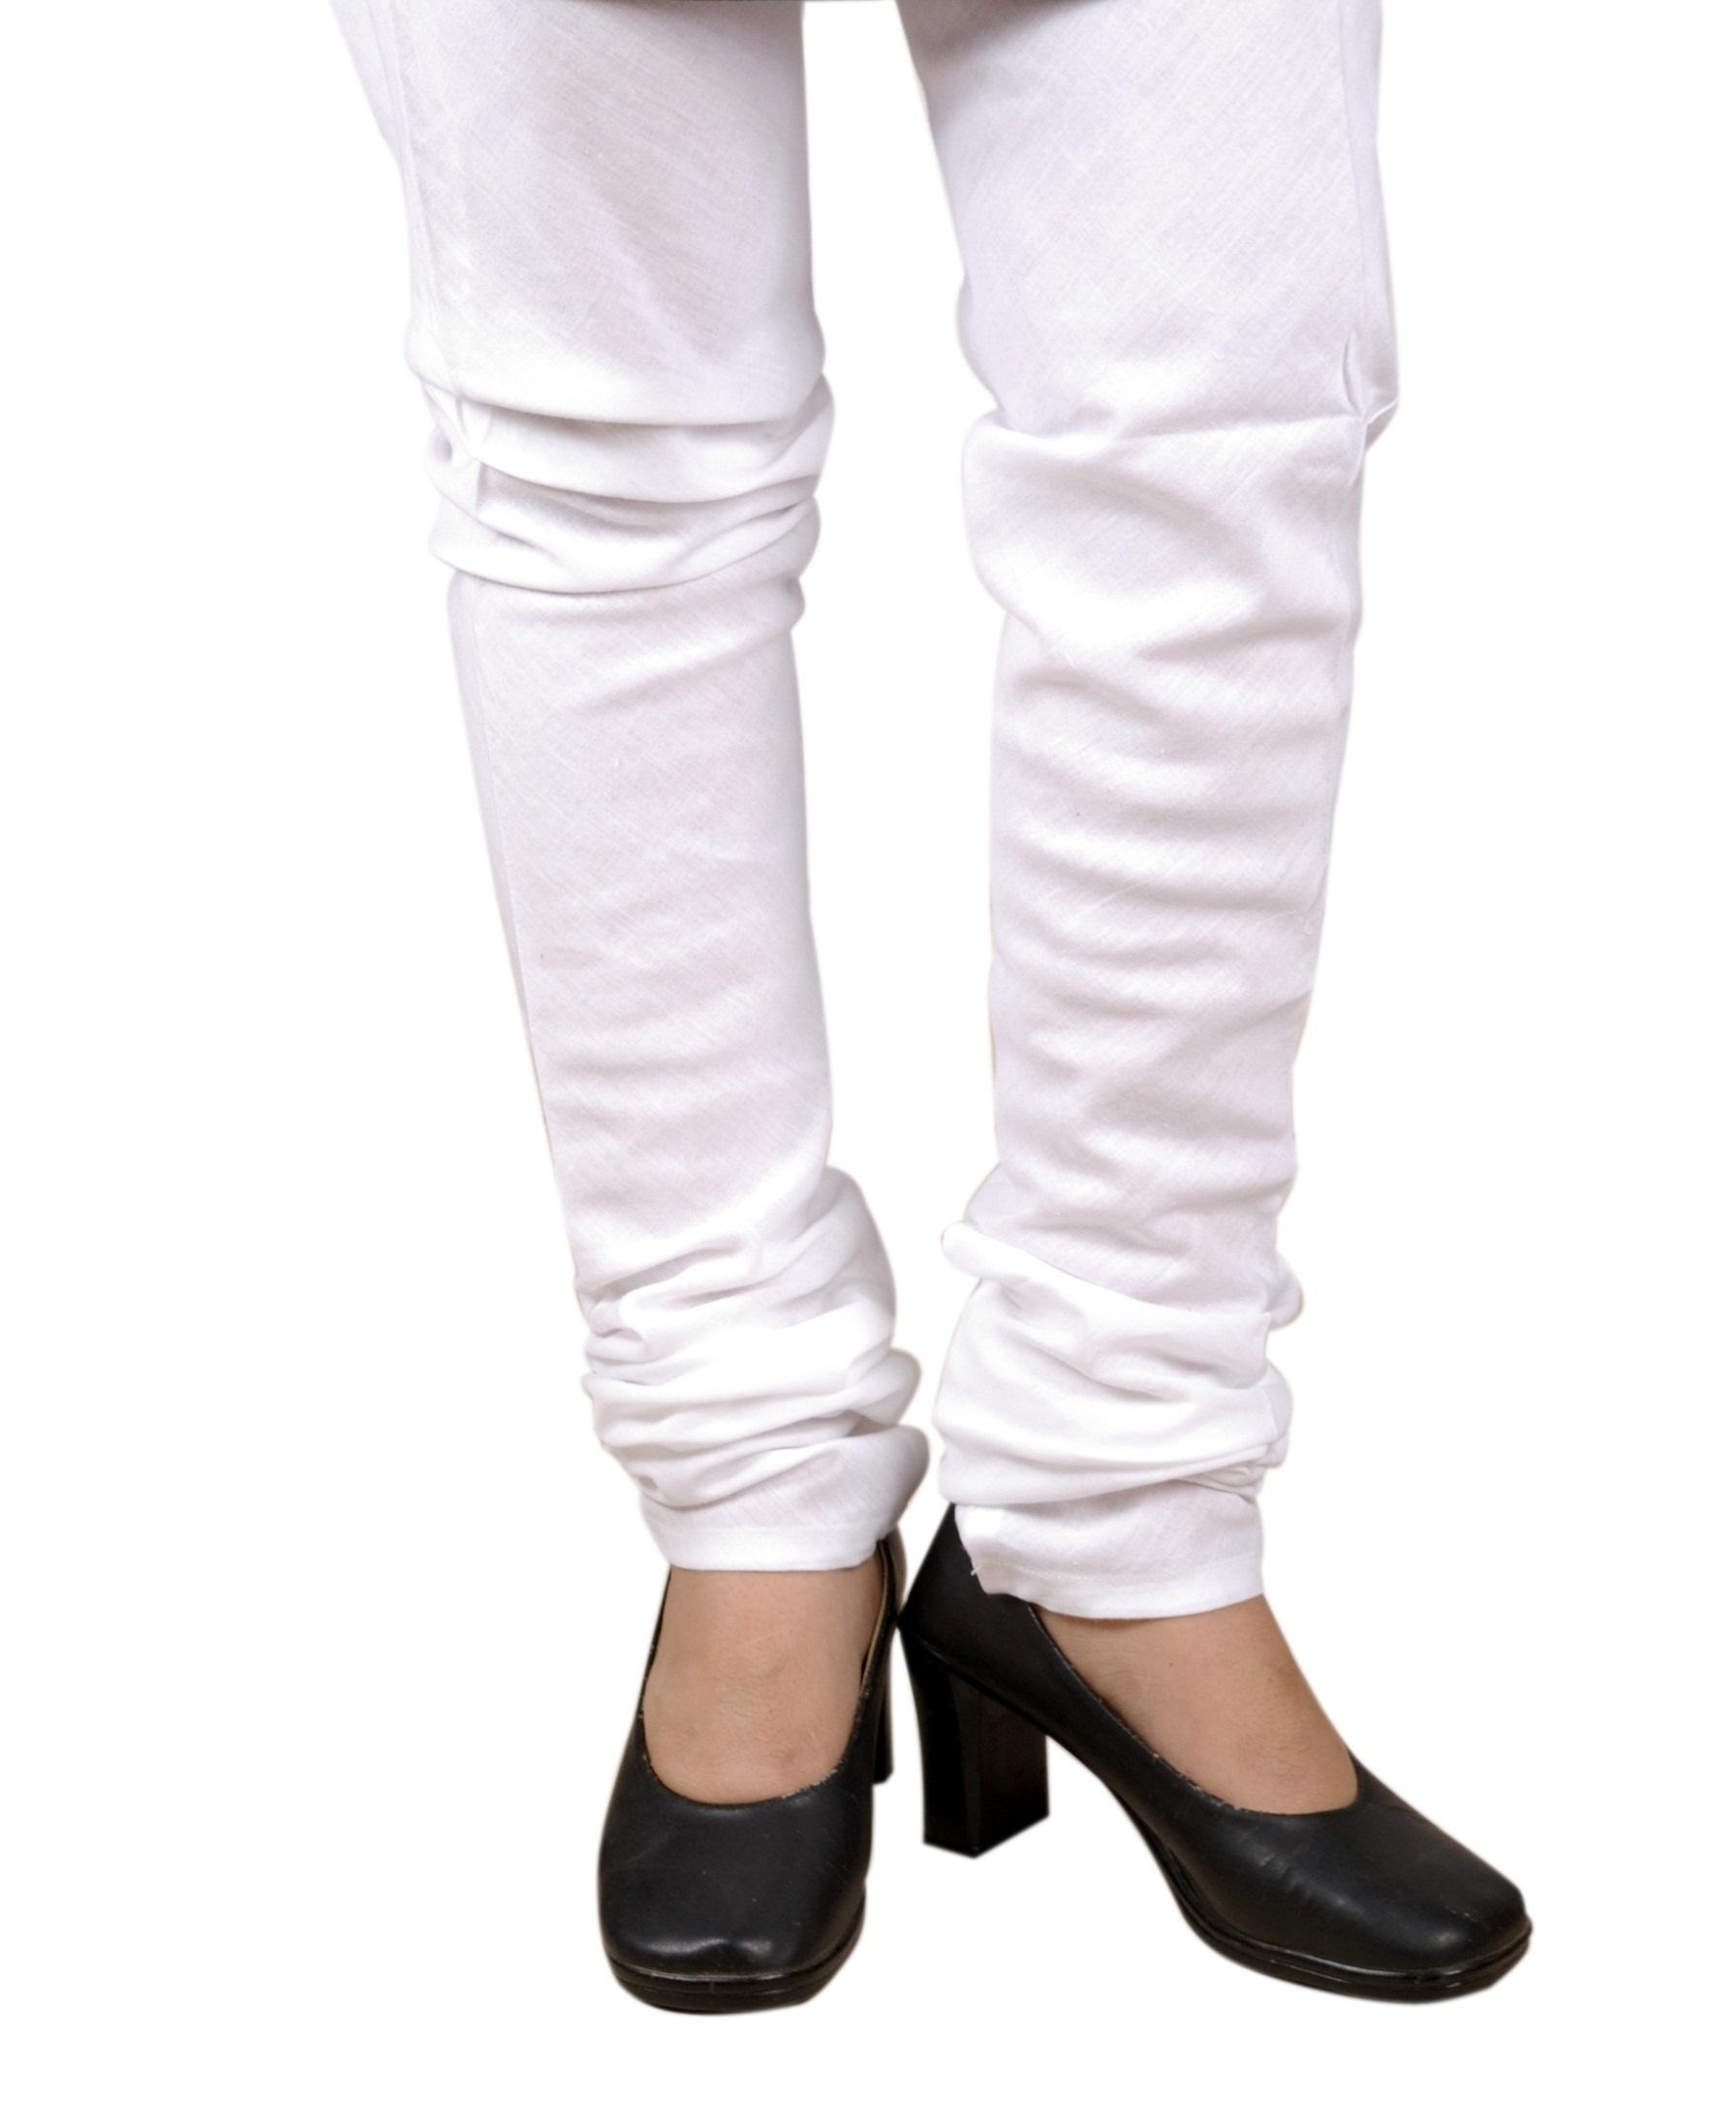 Cotton Churidars, Bottoms, Womens Wear, Indian Concepts, White Churidar